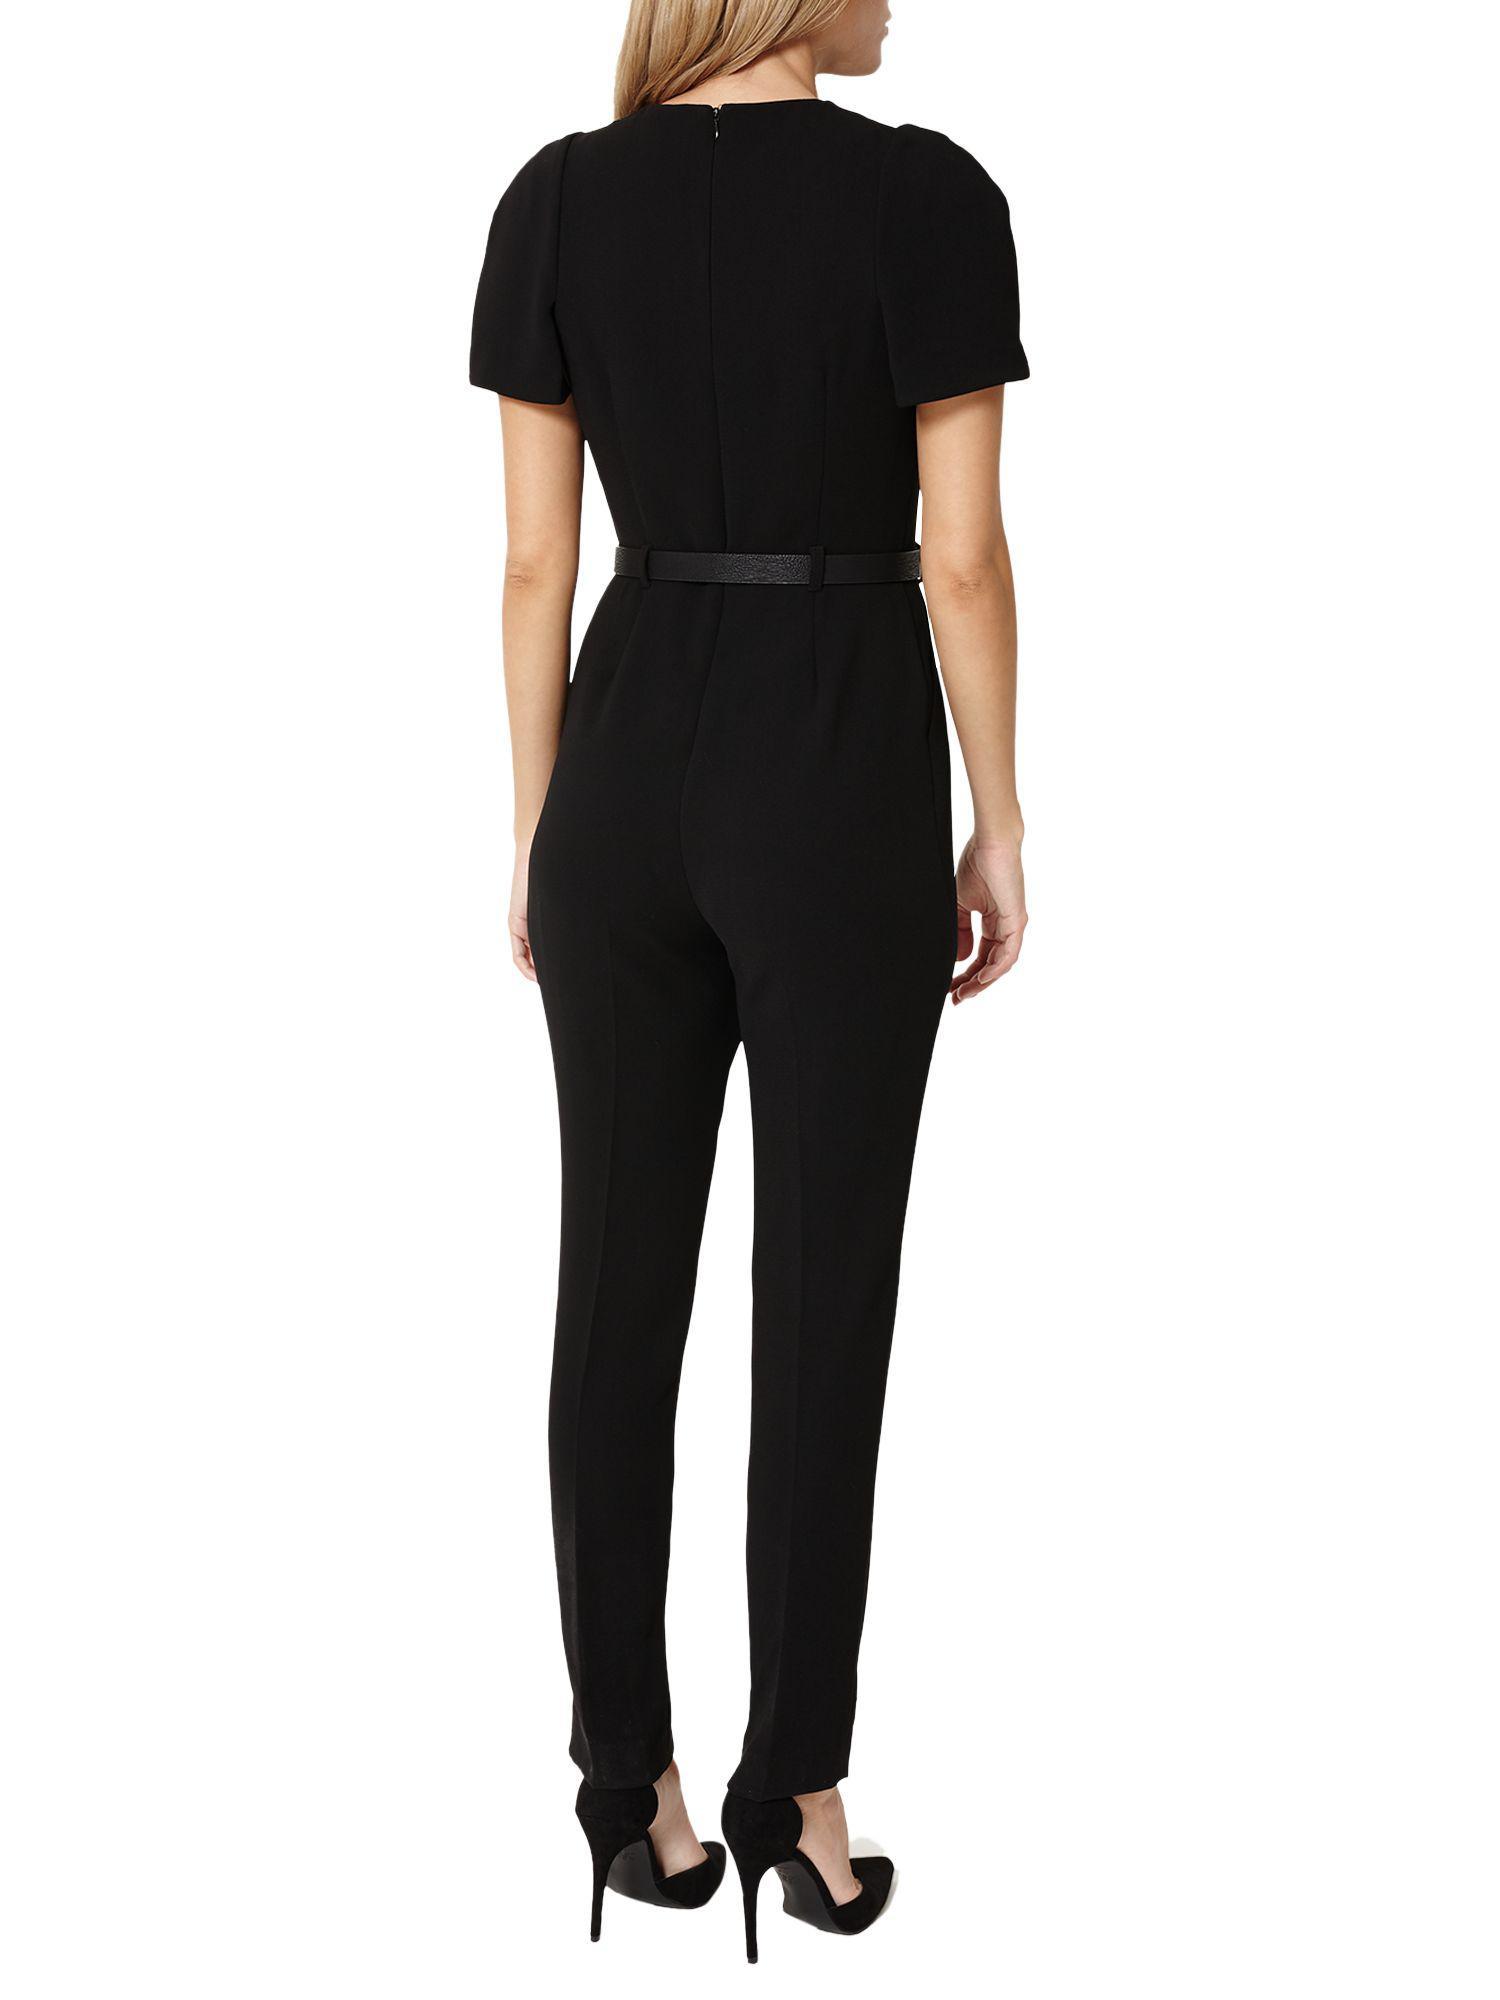 317ceaed5a John Lewis Damsel In A Dress City Suit Jumpsuit in Black - Lyst